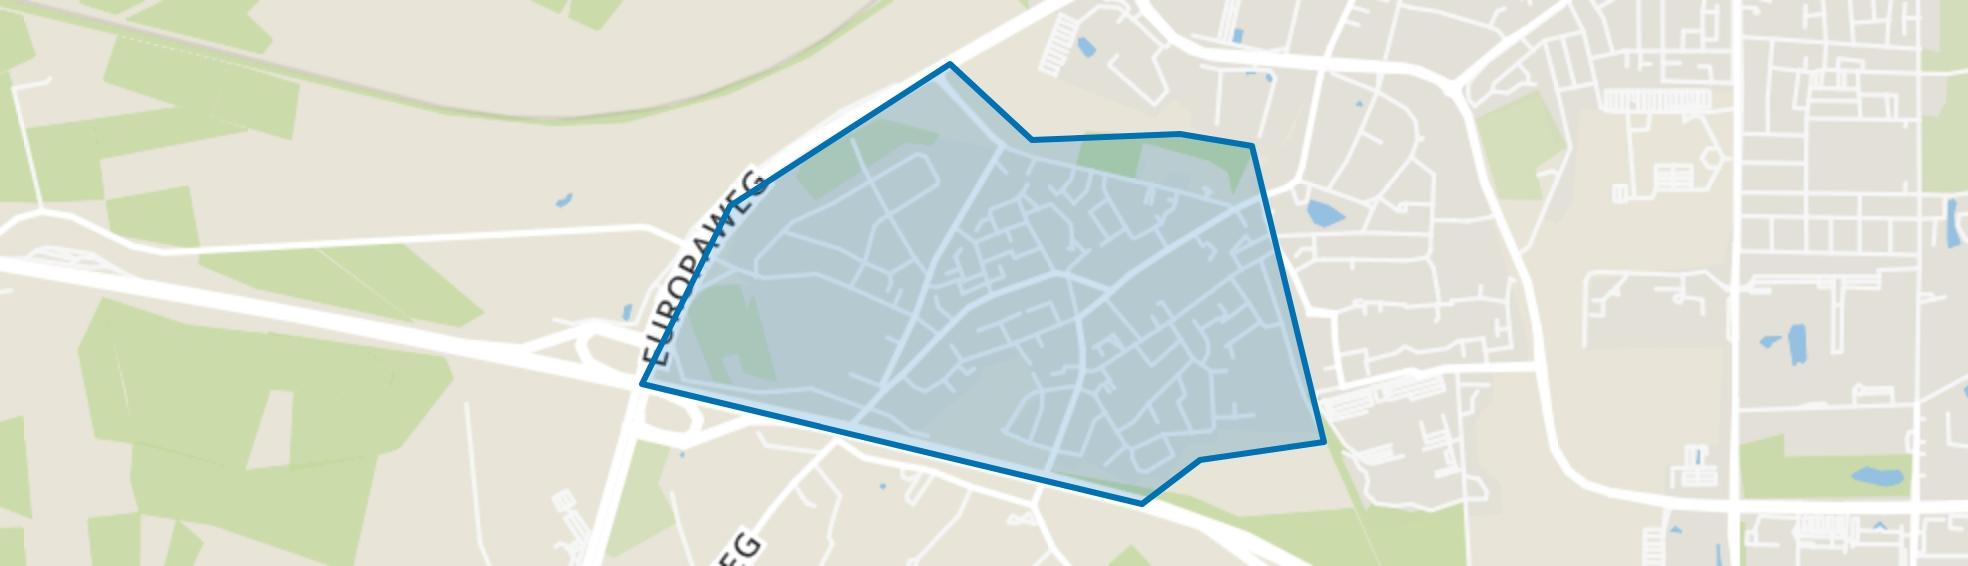 Ugchelen, Ugchelen map